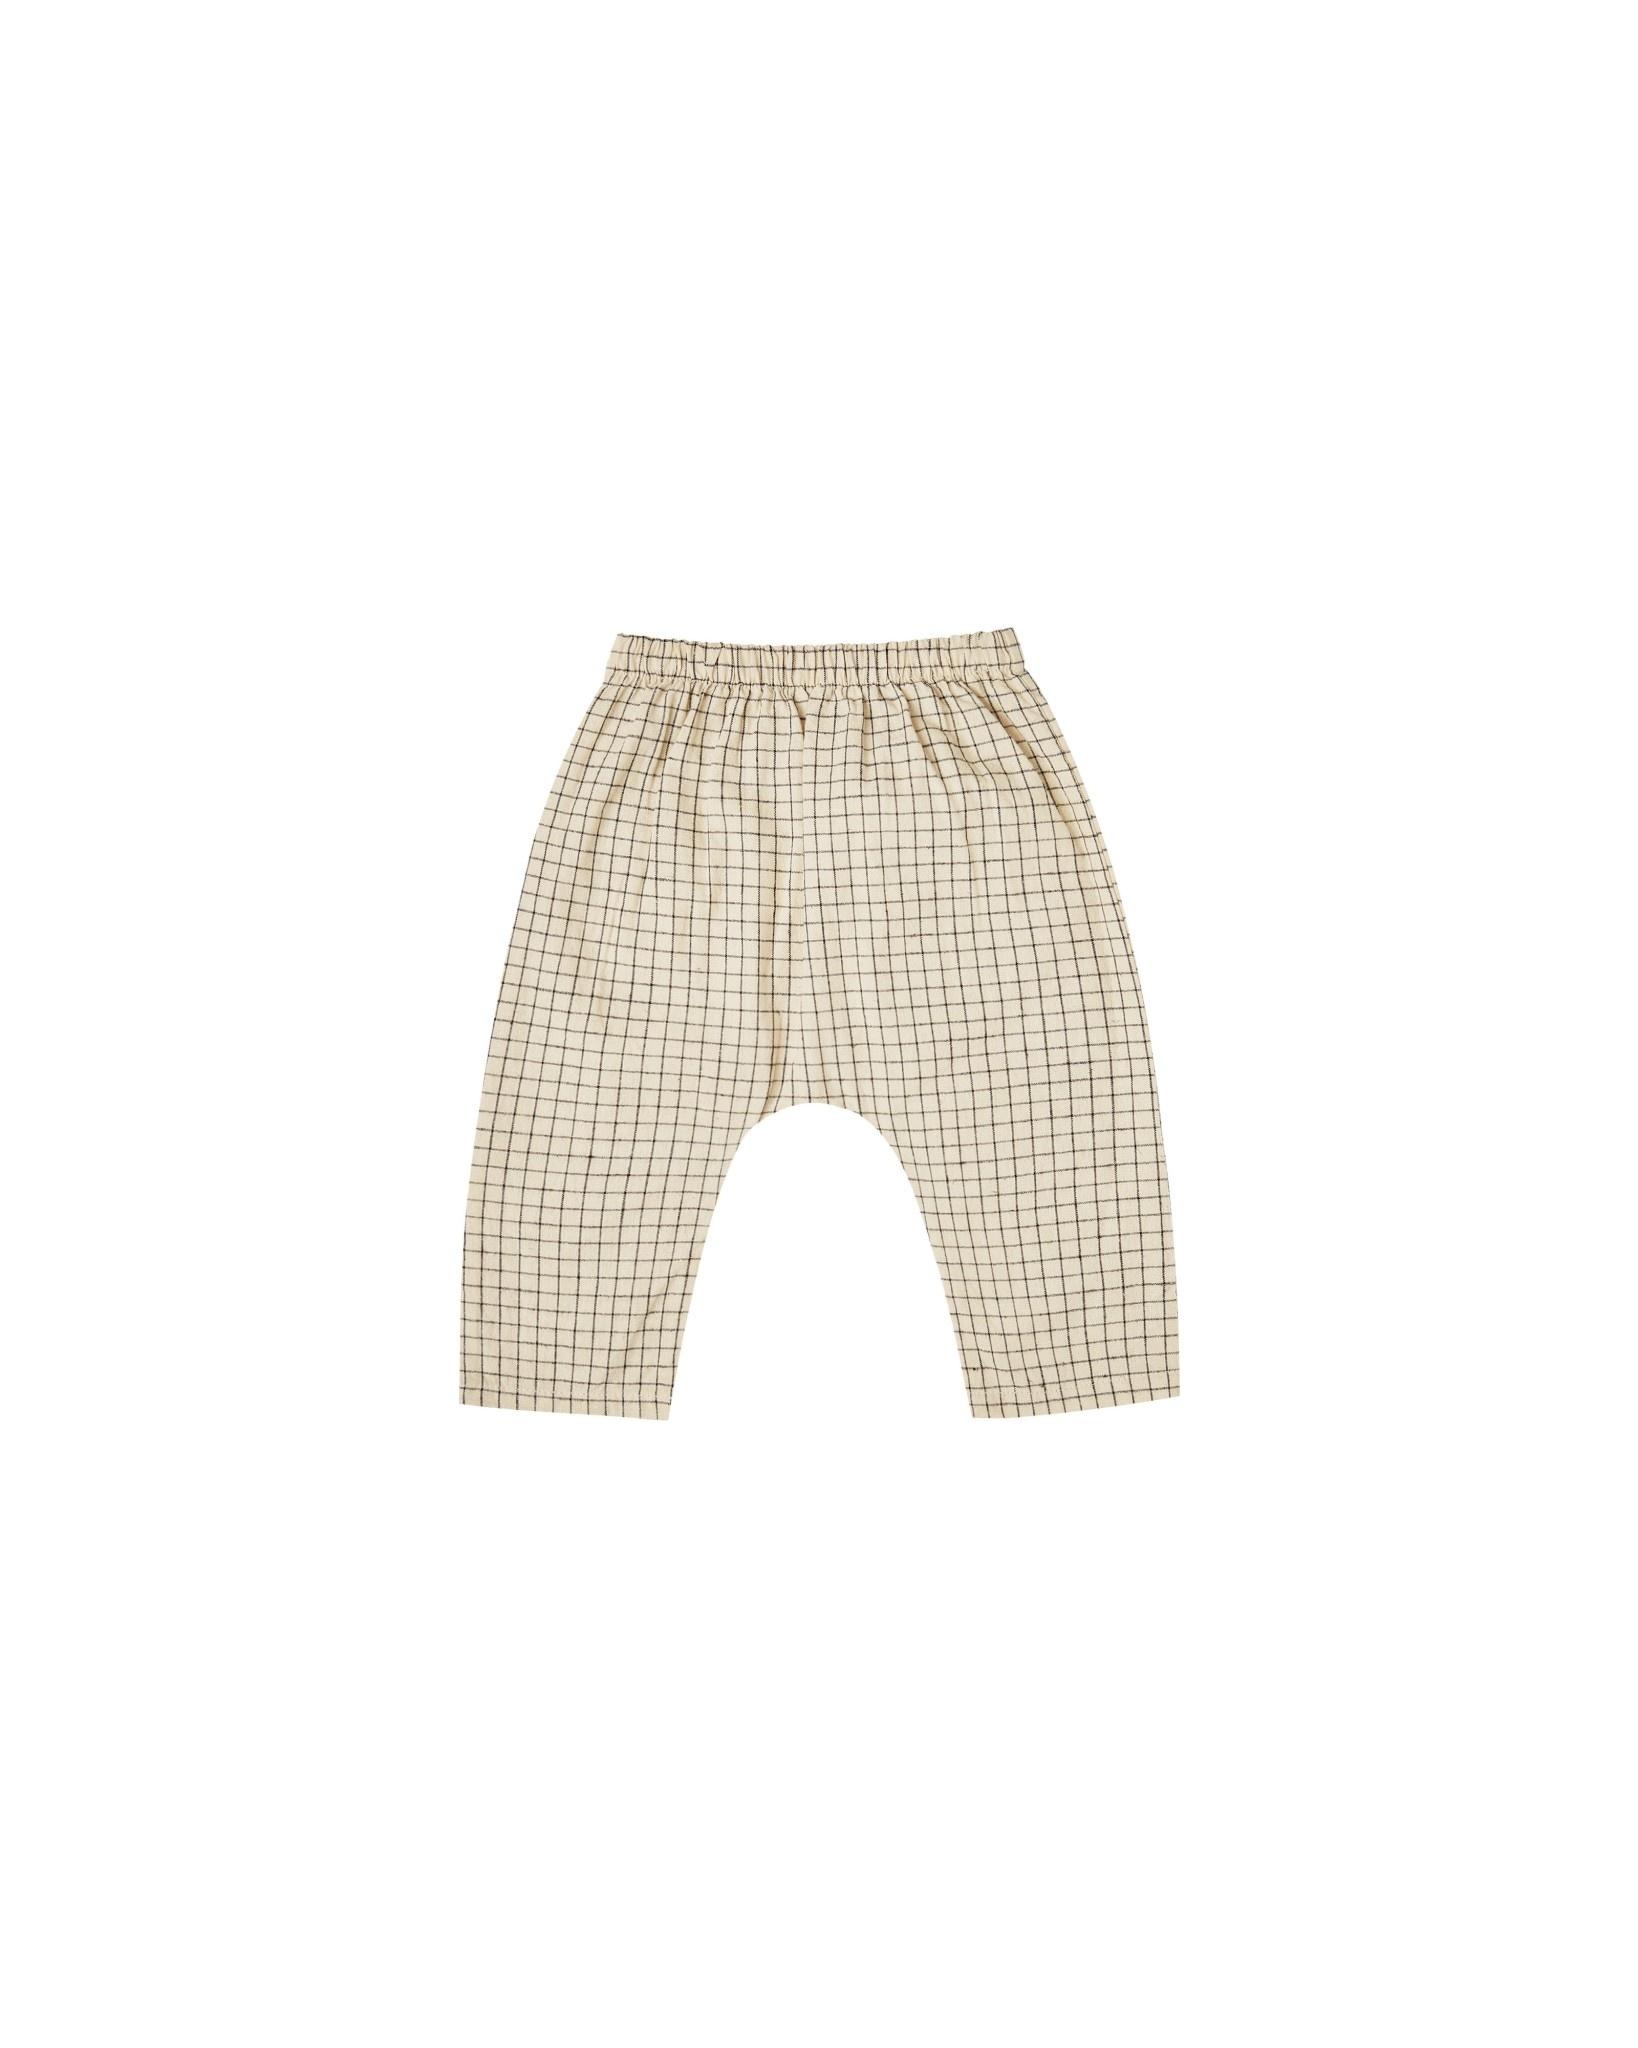 RYLEE AND CRU Grid Orion Harem Pants